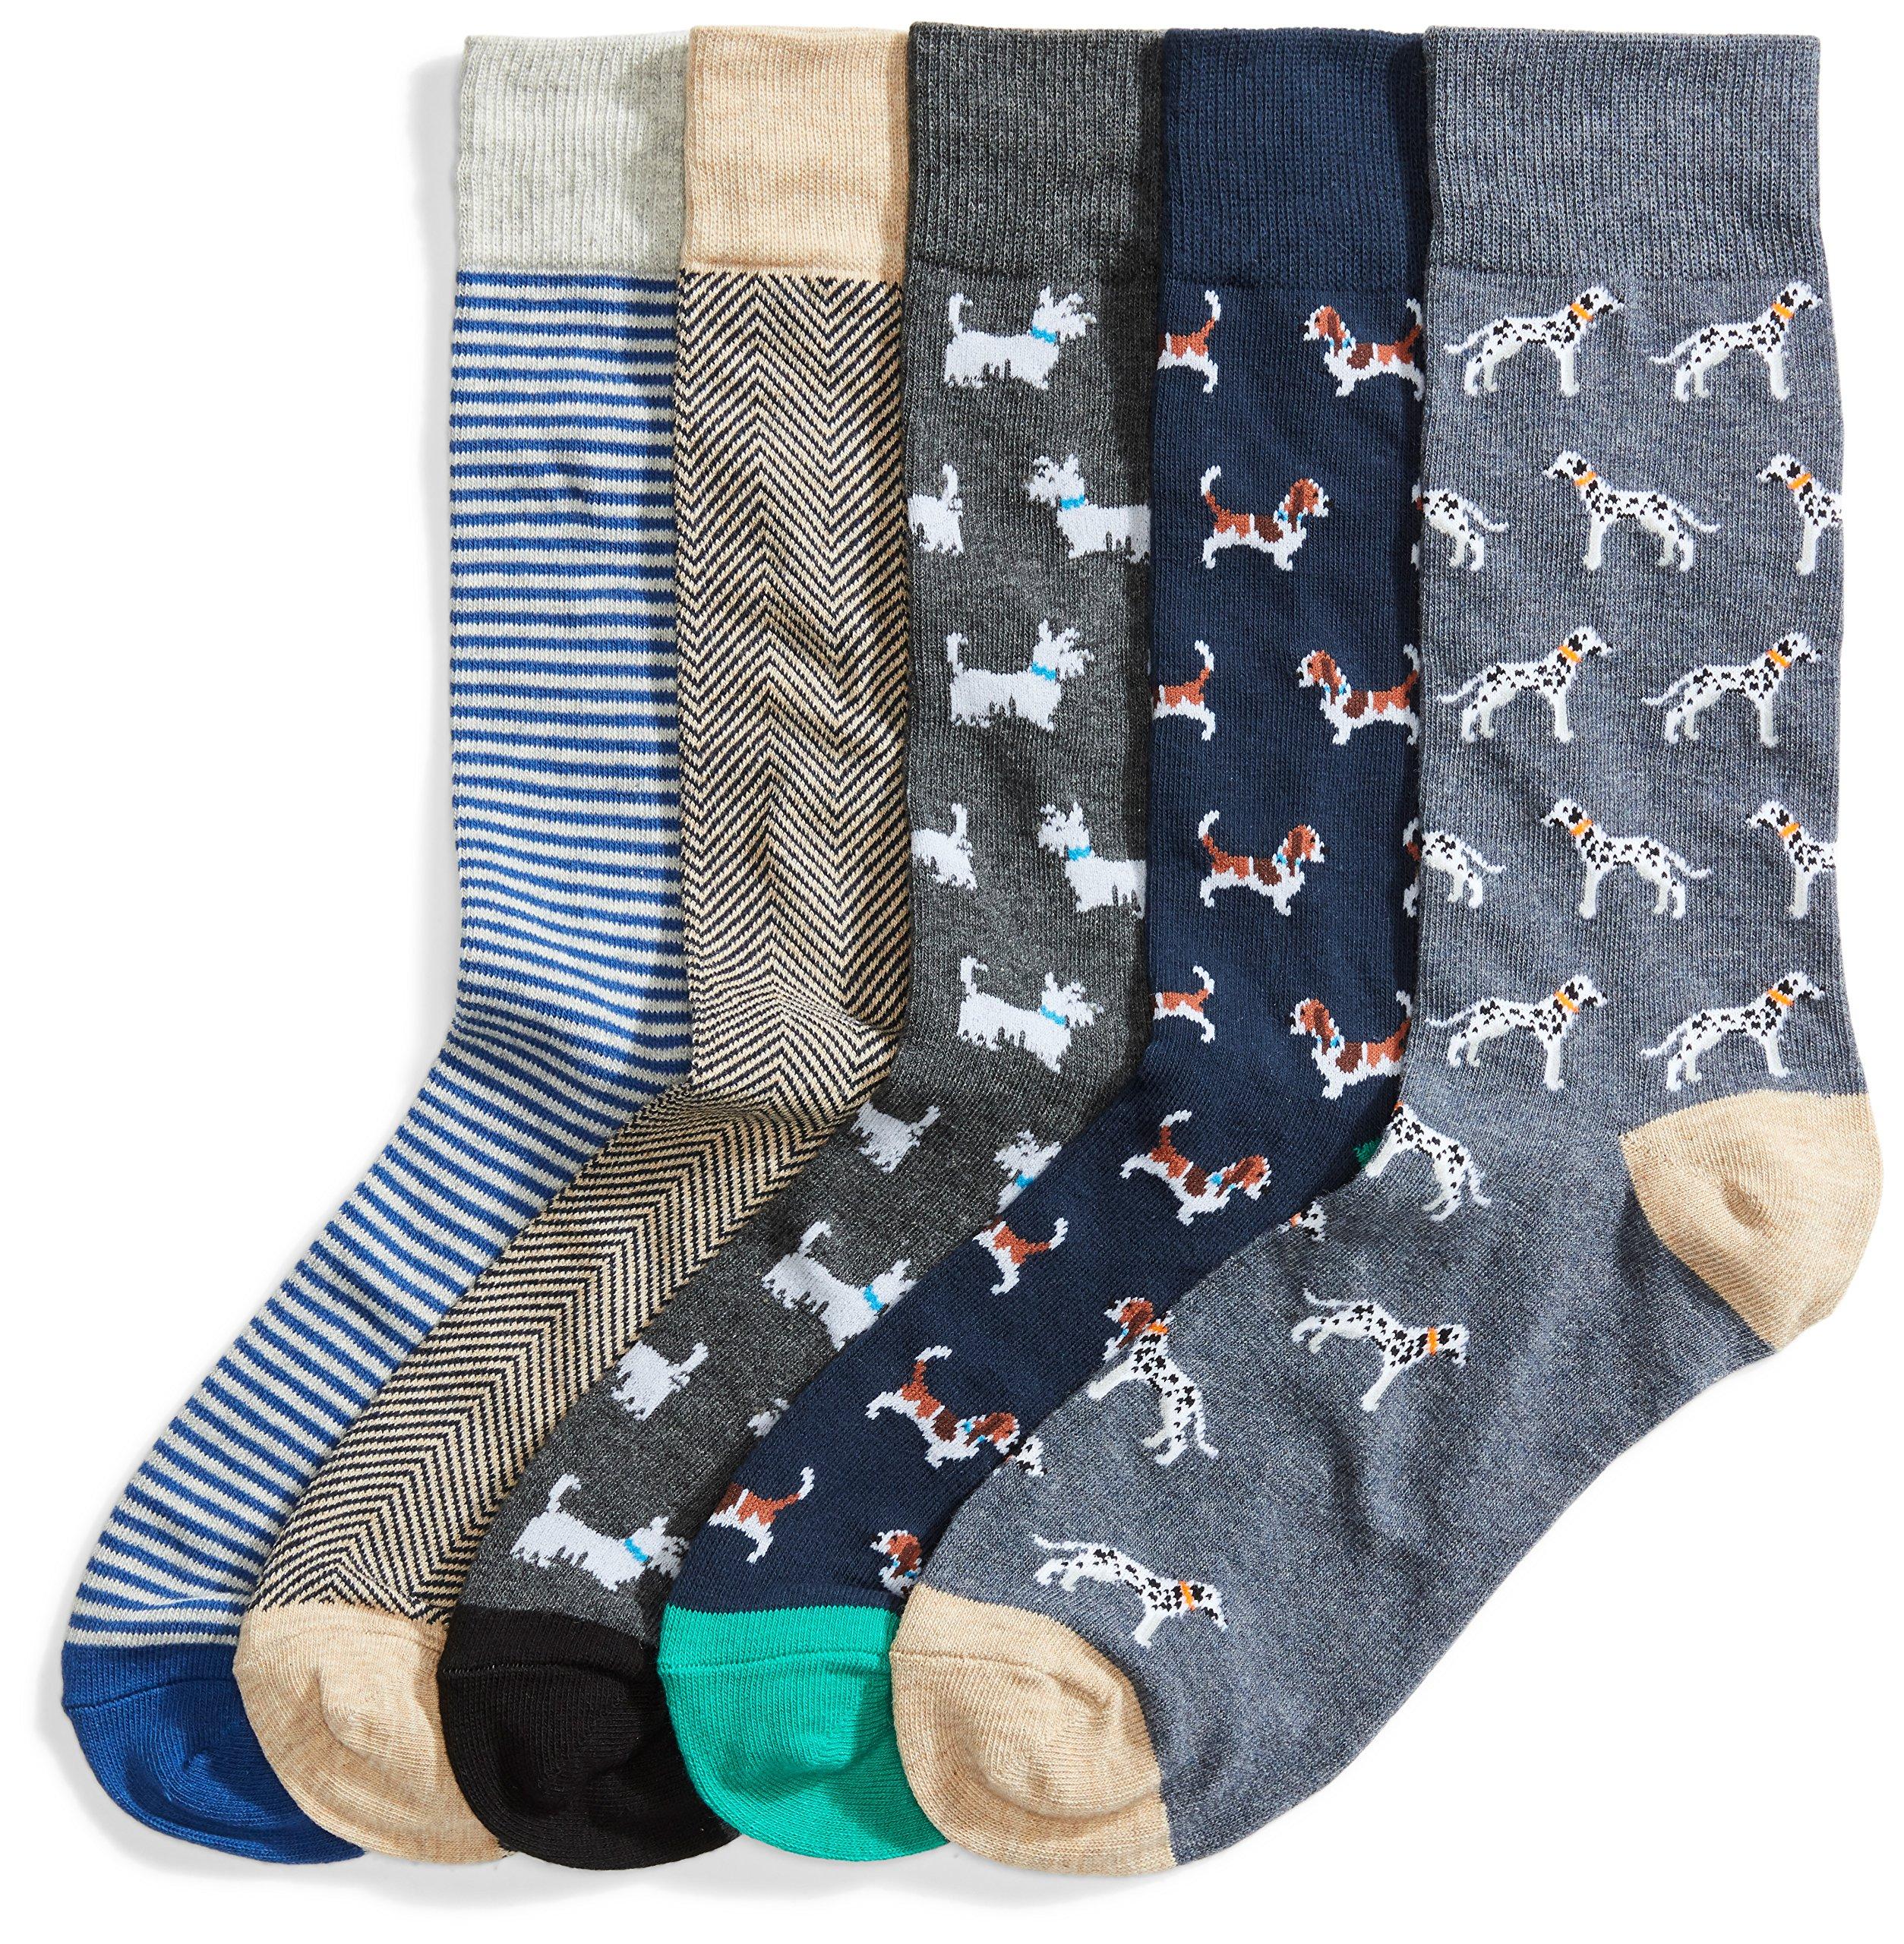 Goodthreads Men's 5-Pack Patterned Socks, Assorted Dogs, Shoe Size: 8-12